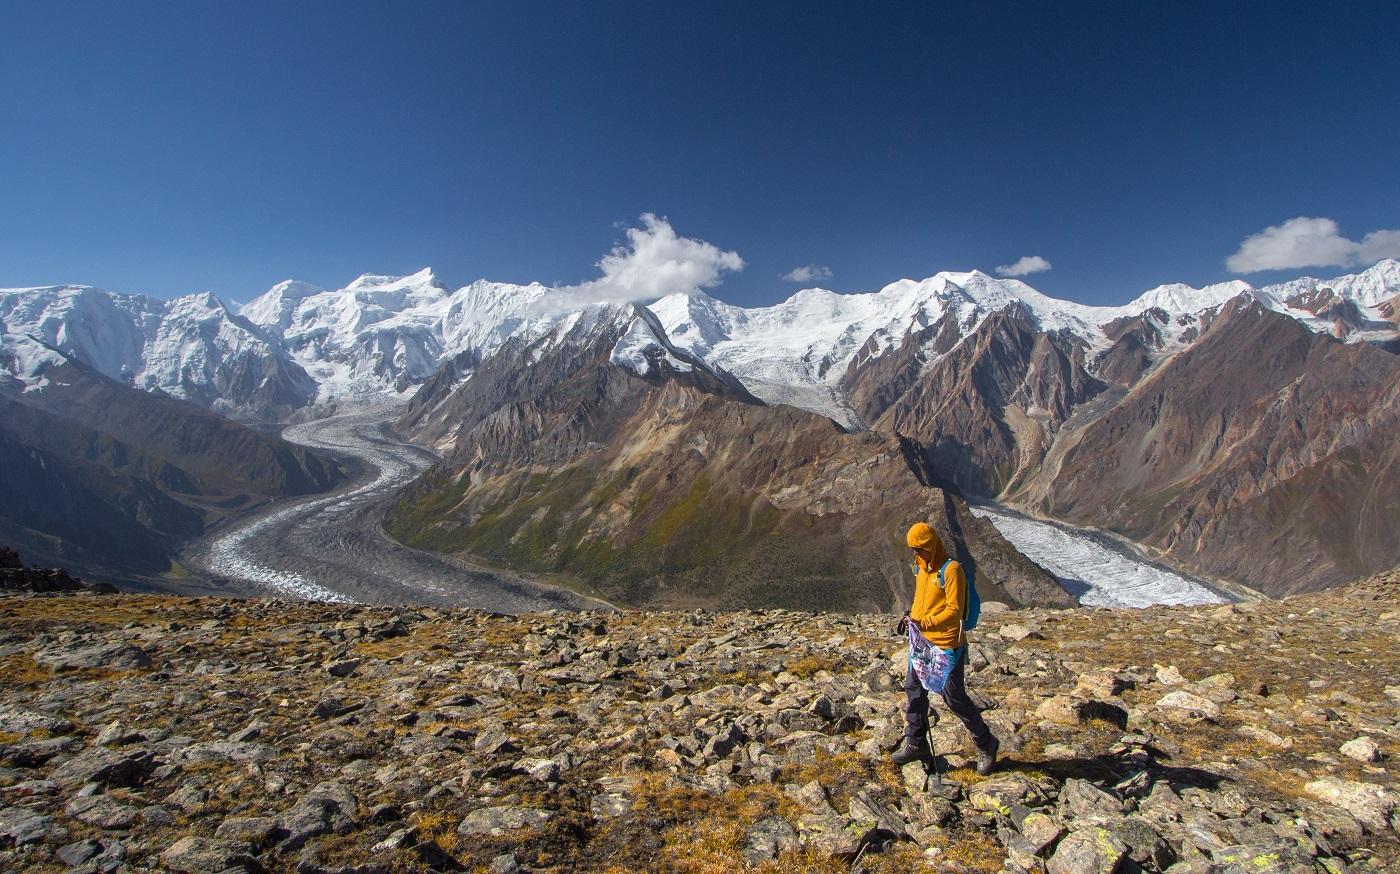 Pakistan - horská turistika medzi 7 tisícovkami